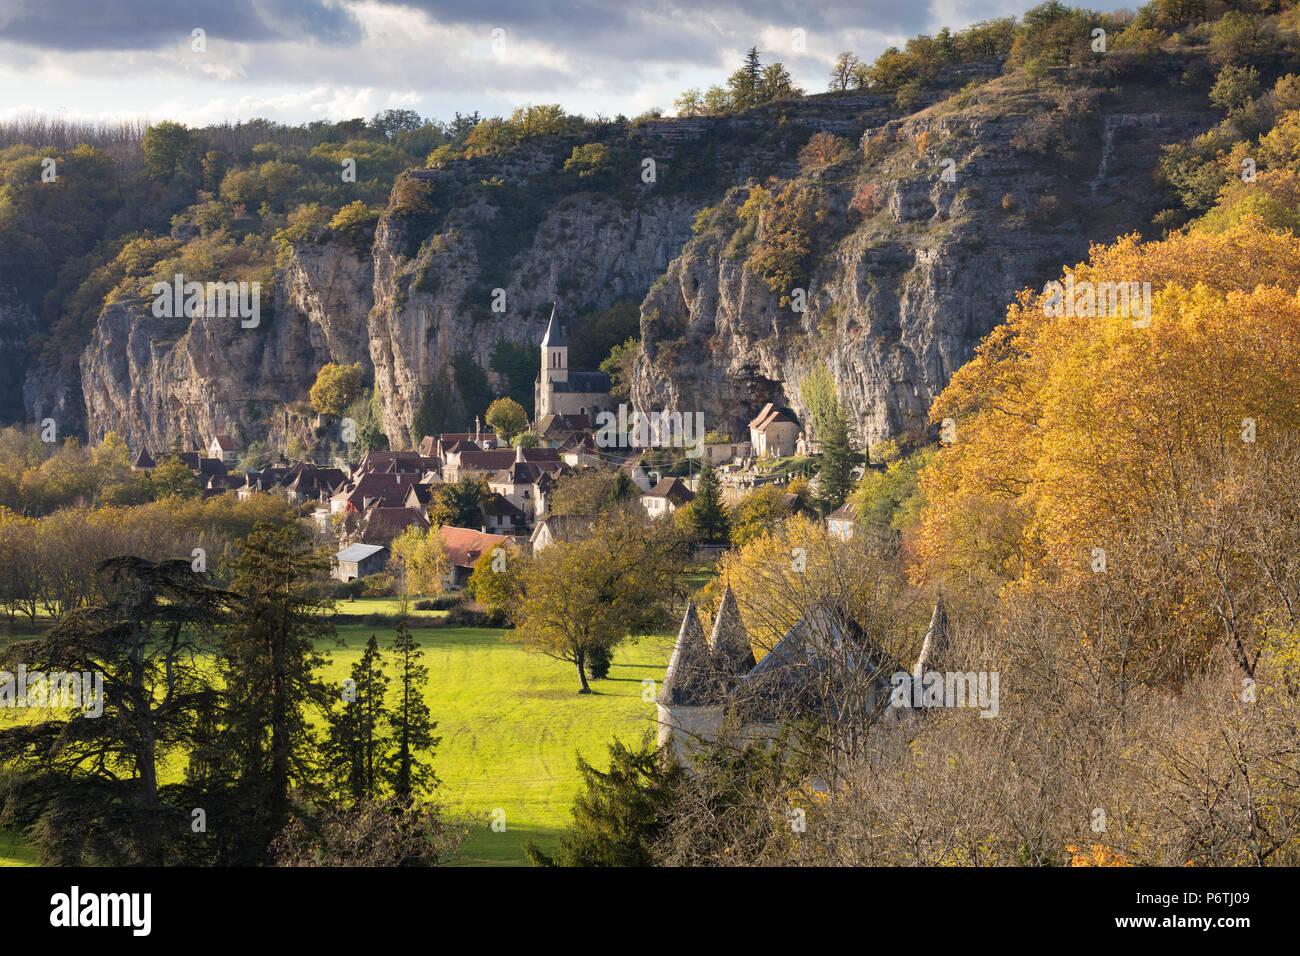 Dorf Gourdon im Herbst, Lot, Midi-Pyrénées, Frankreich Stockfoto